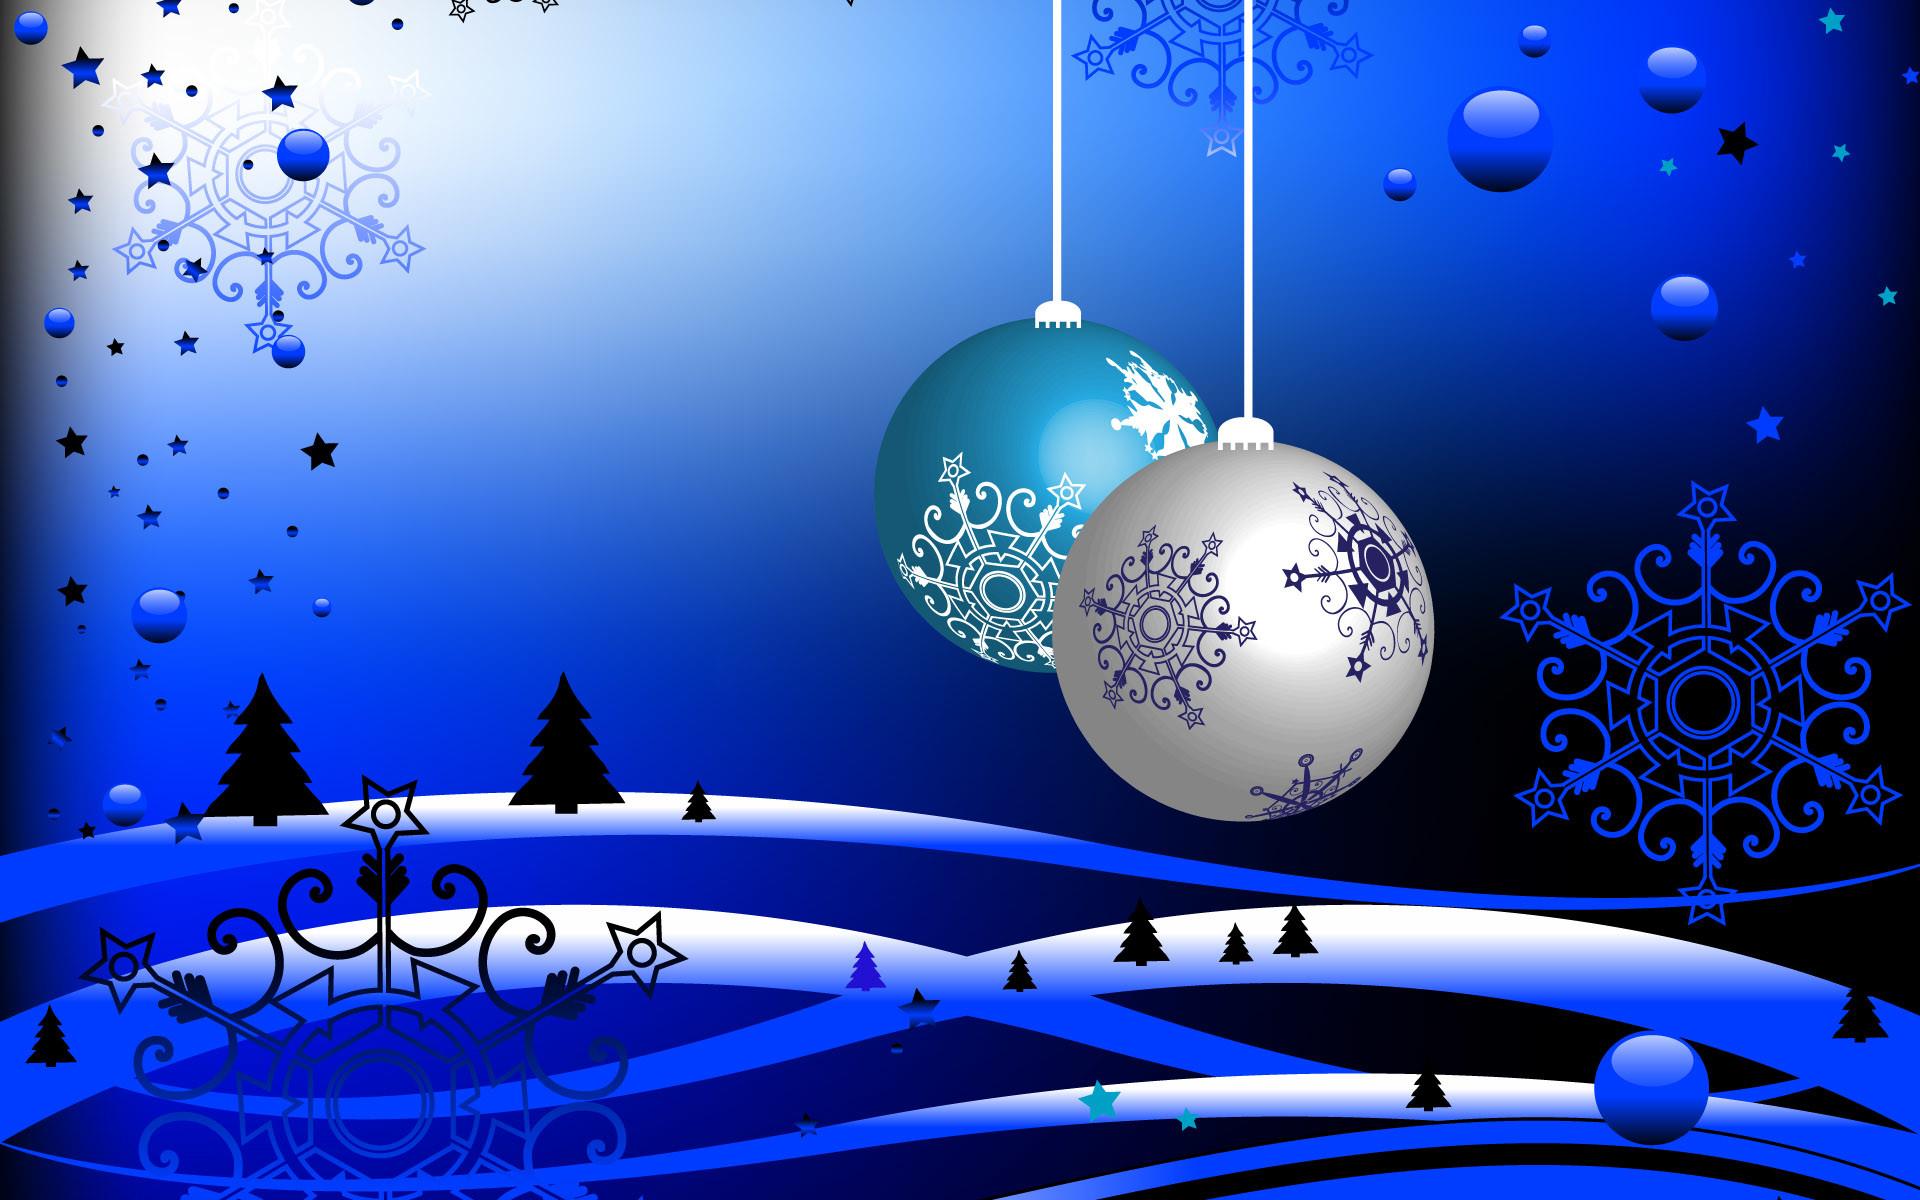 Bright & Shining Christmas HD Wallpaper for desktop